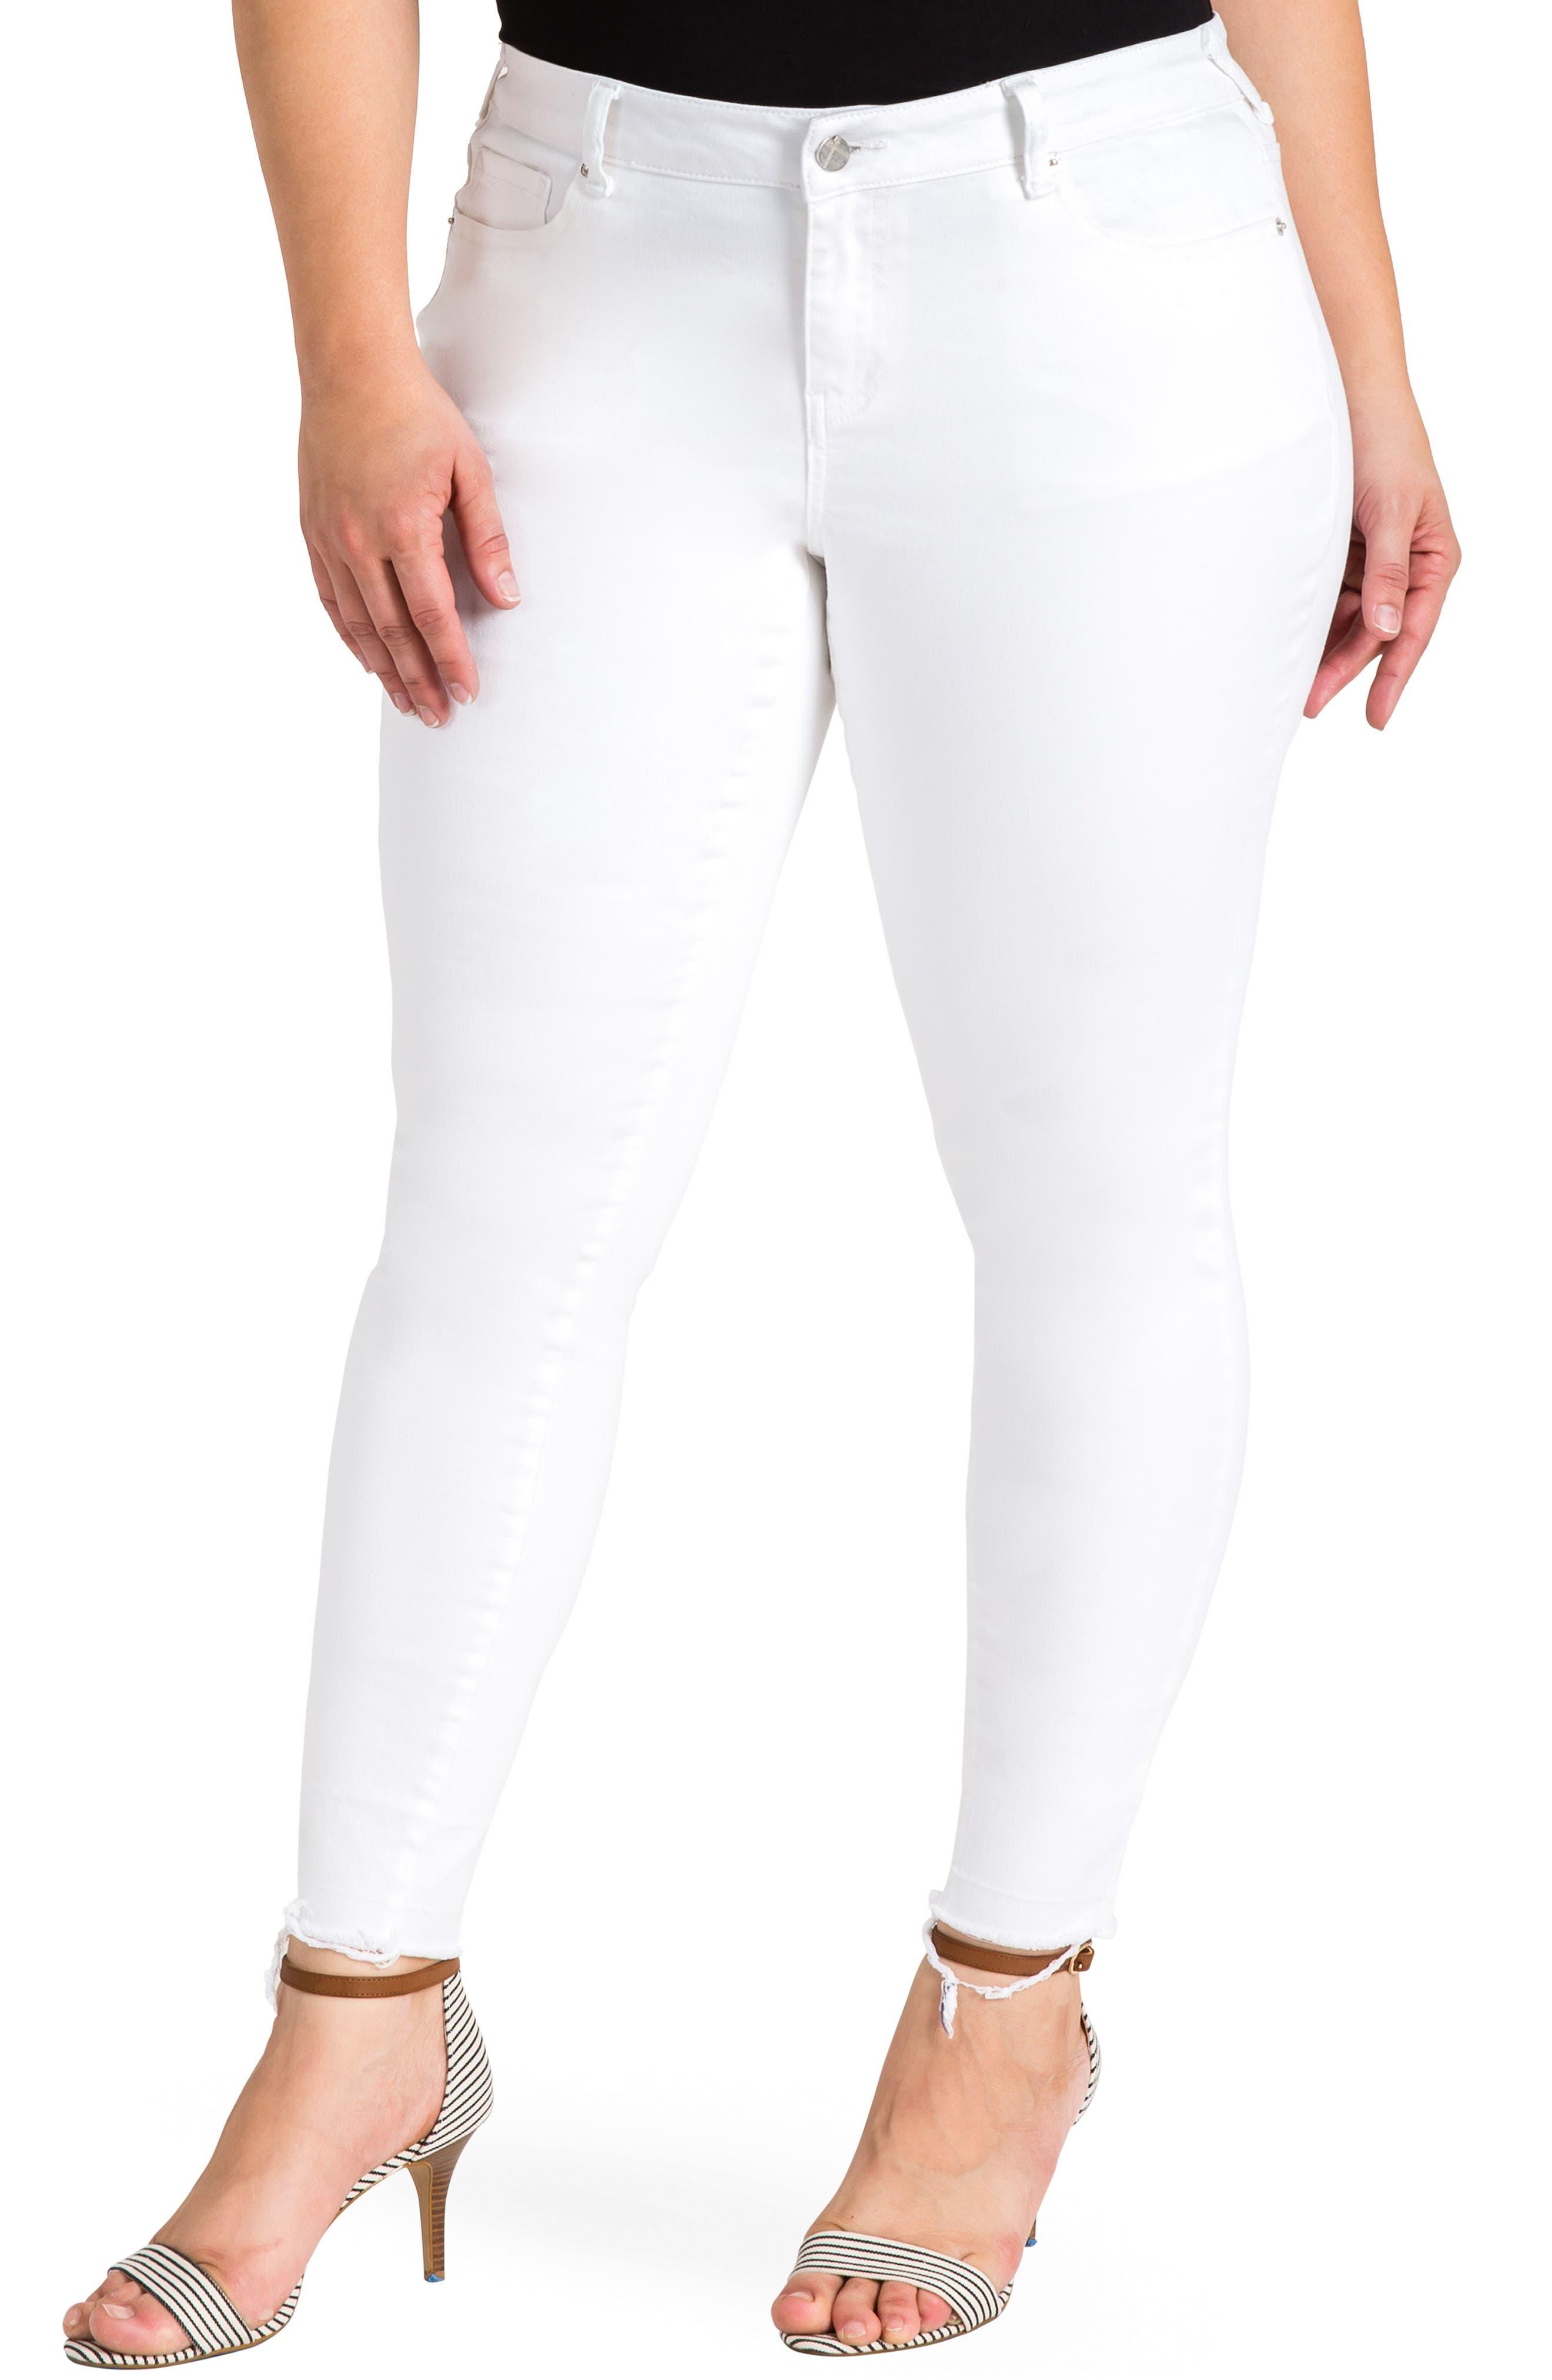 Virginia Ankle Skinny Jeans,                             Main thumbnail 1, color,                             3087Powderwt - White